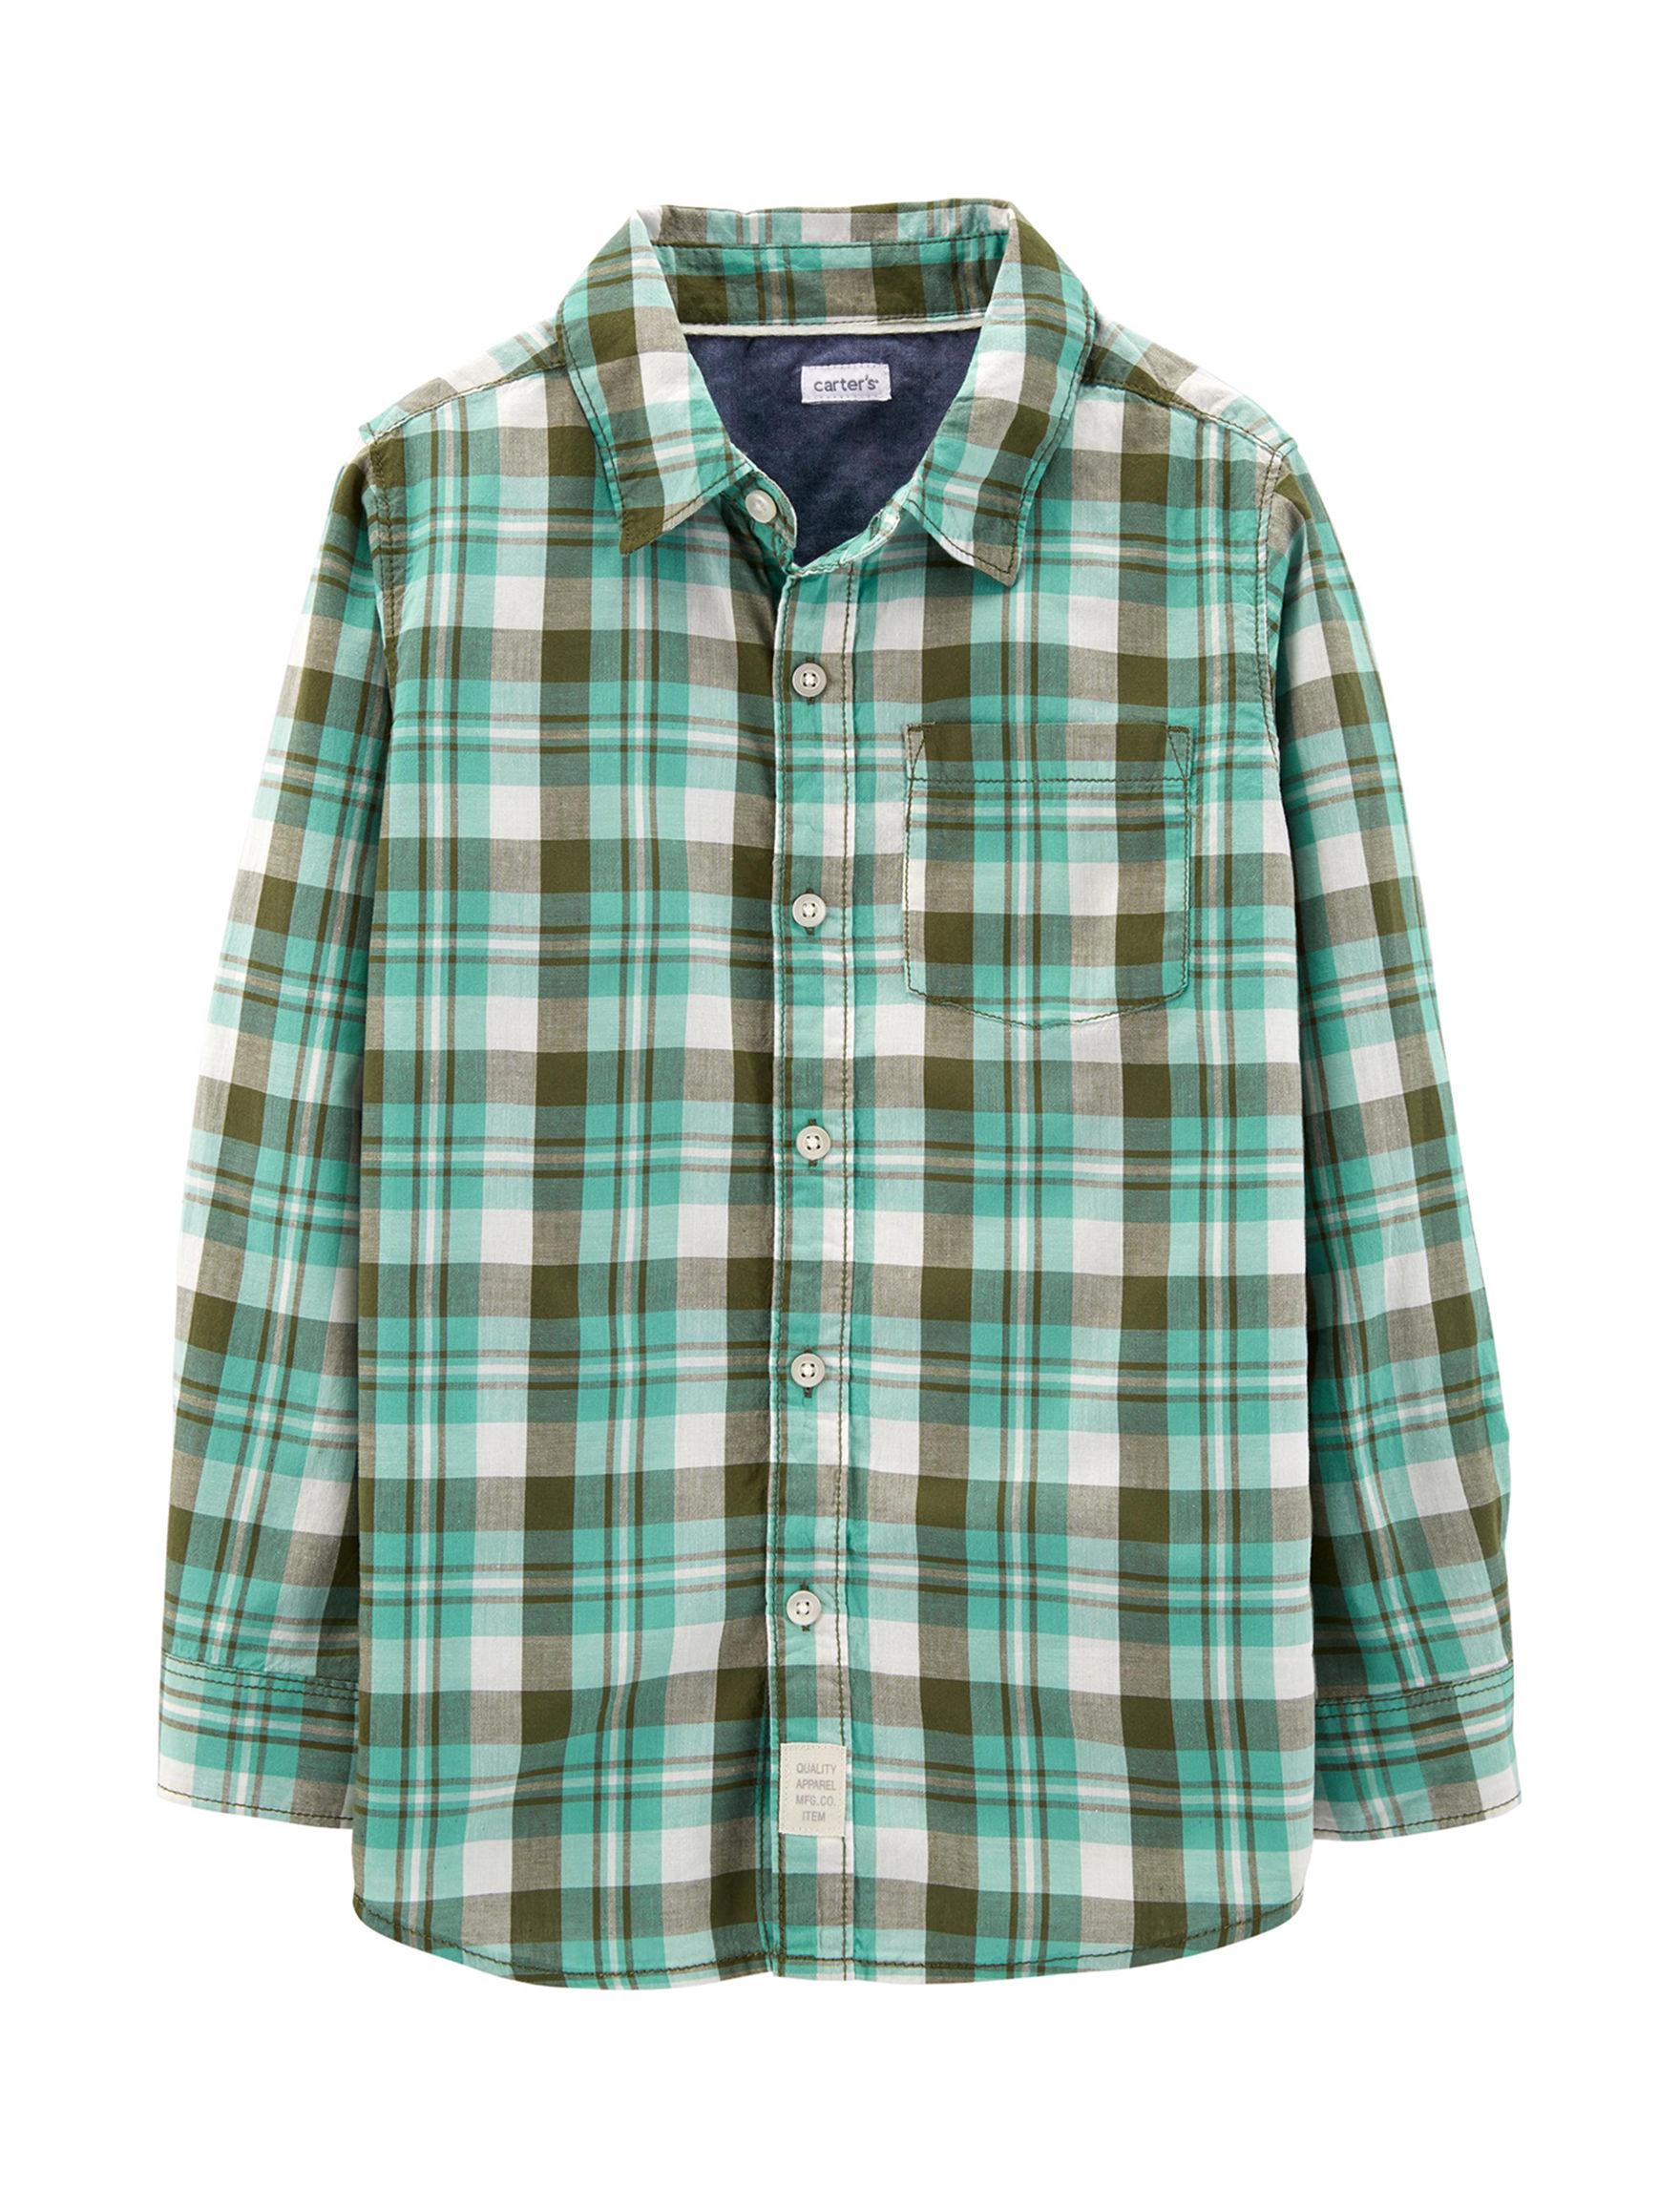 Carter's Green Plaid Casual Button Down Shirts